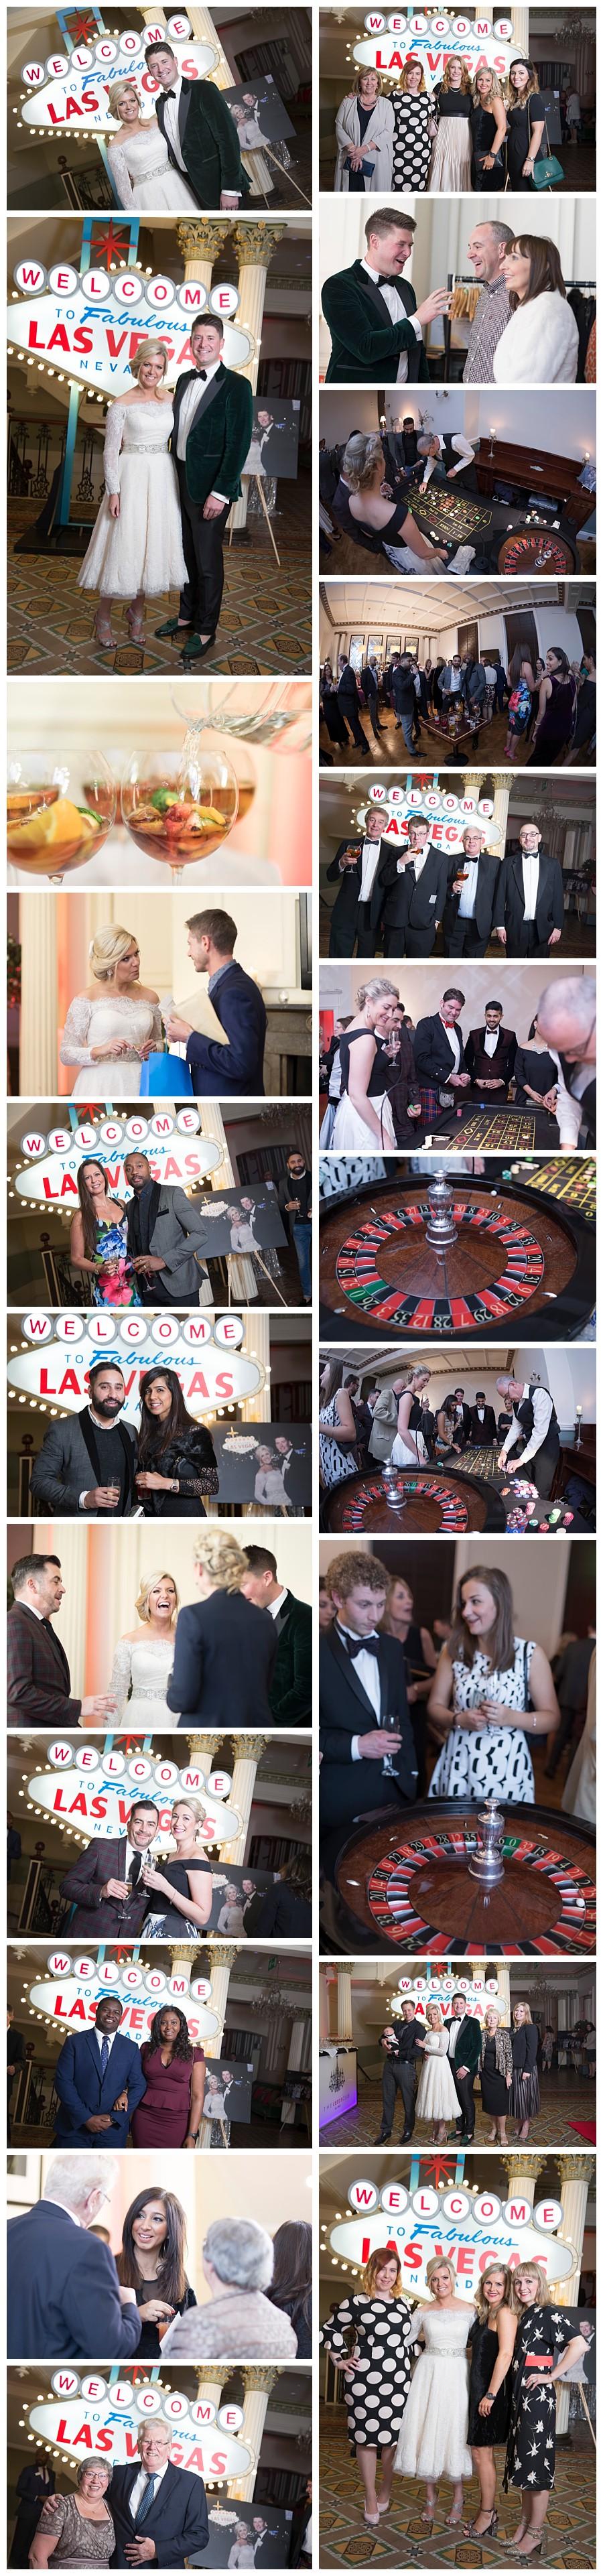 Photographer Leeds Weddings, wedding reception at Leeds Club, giant Las Vegas sign hire